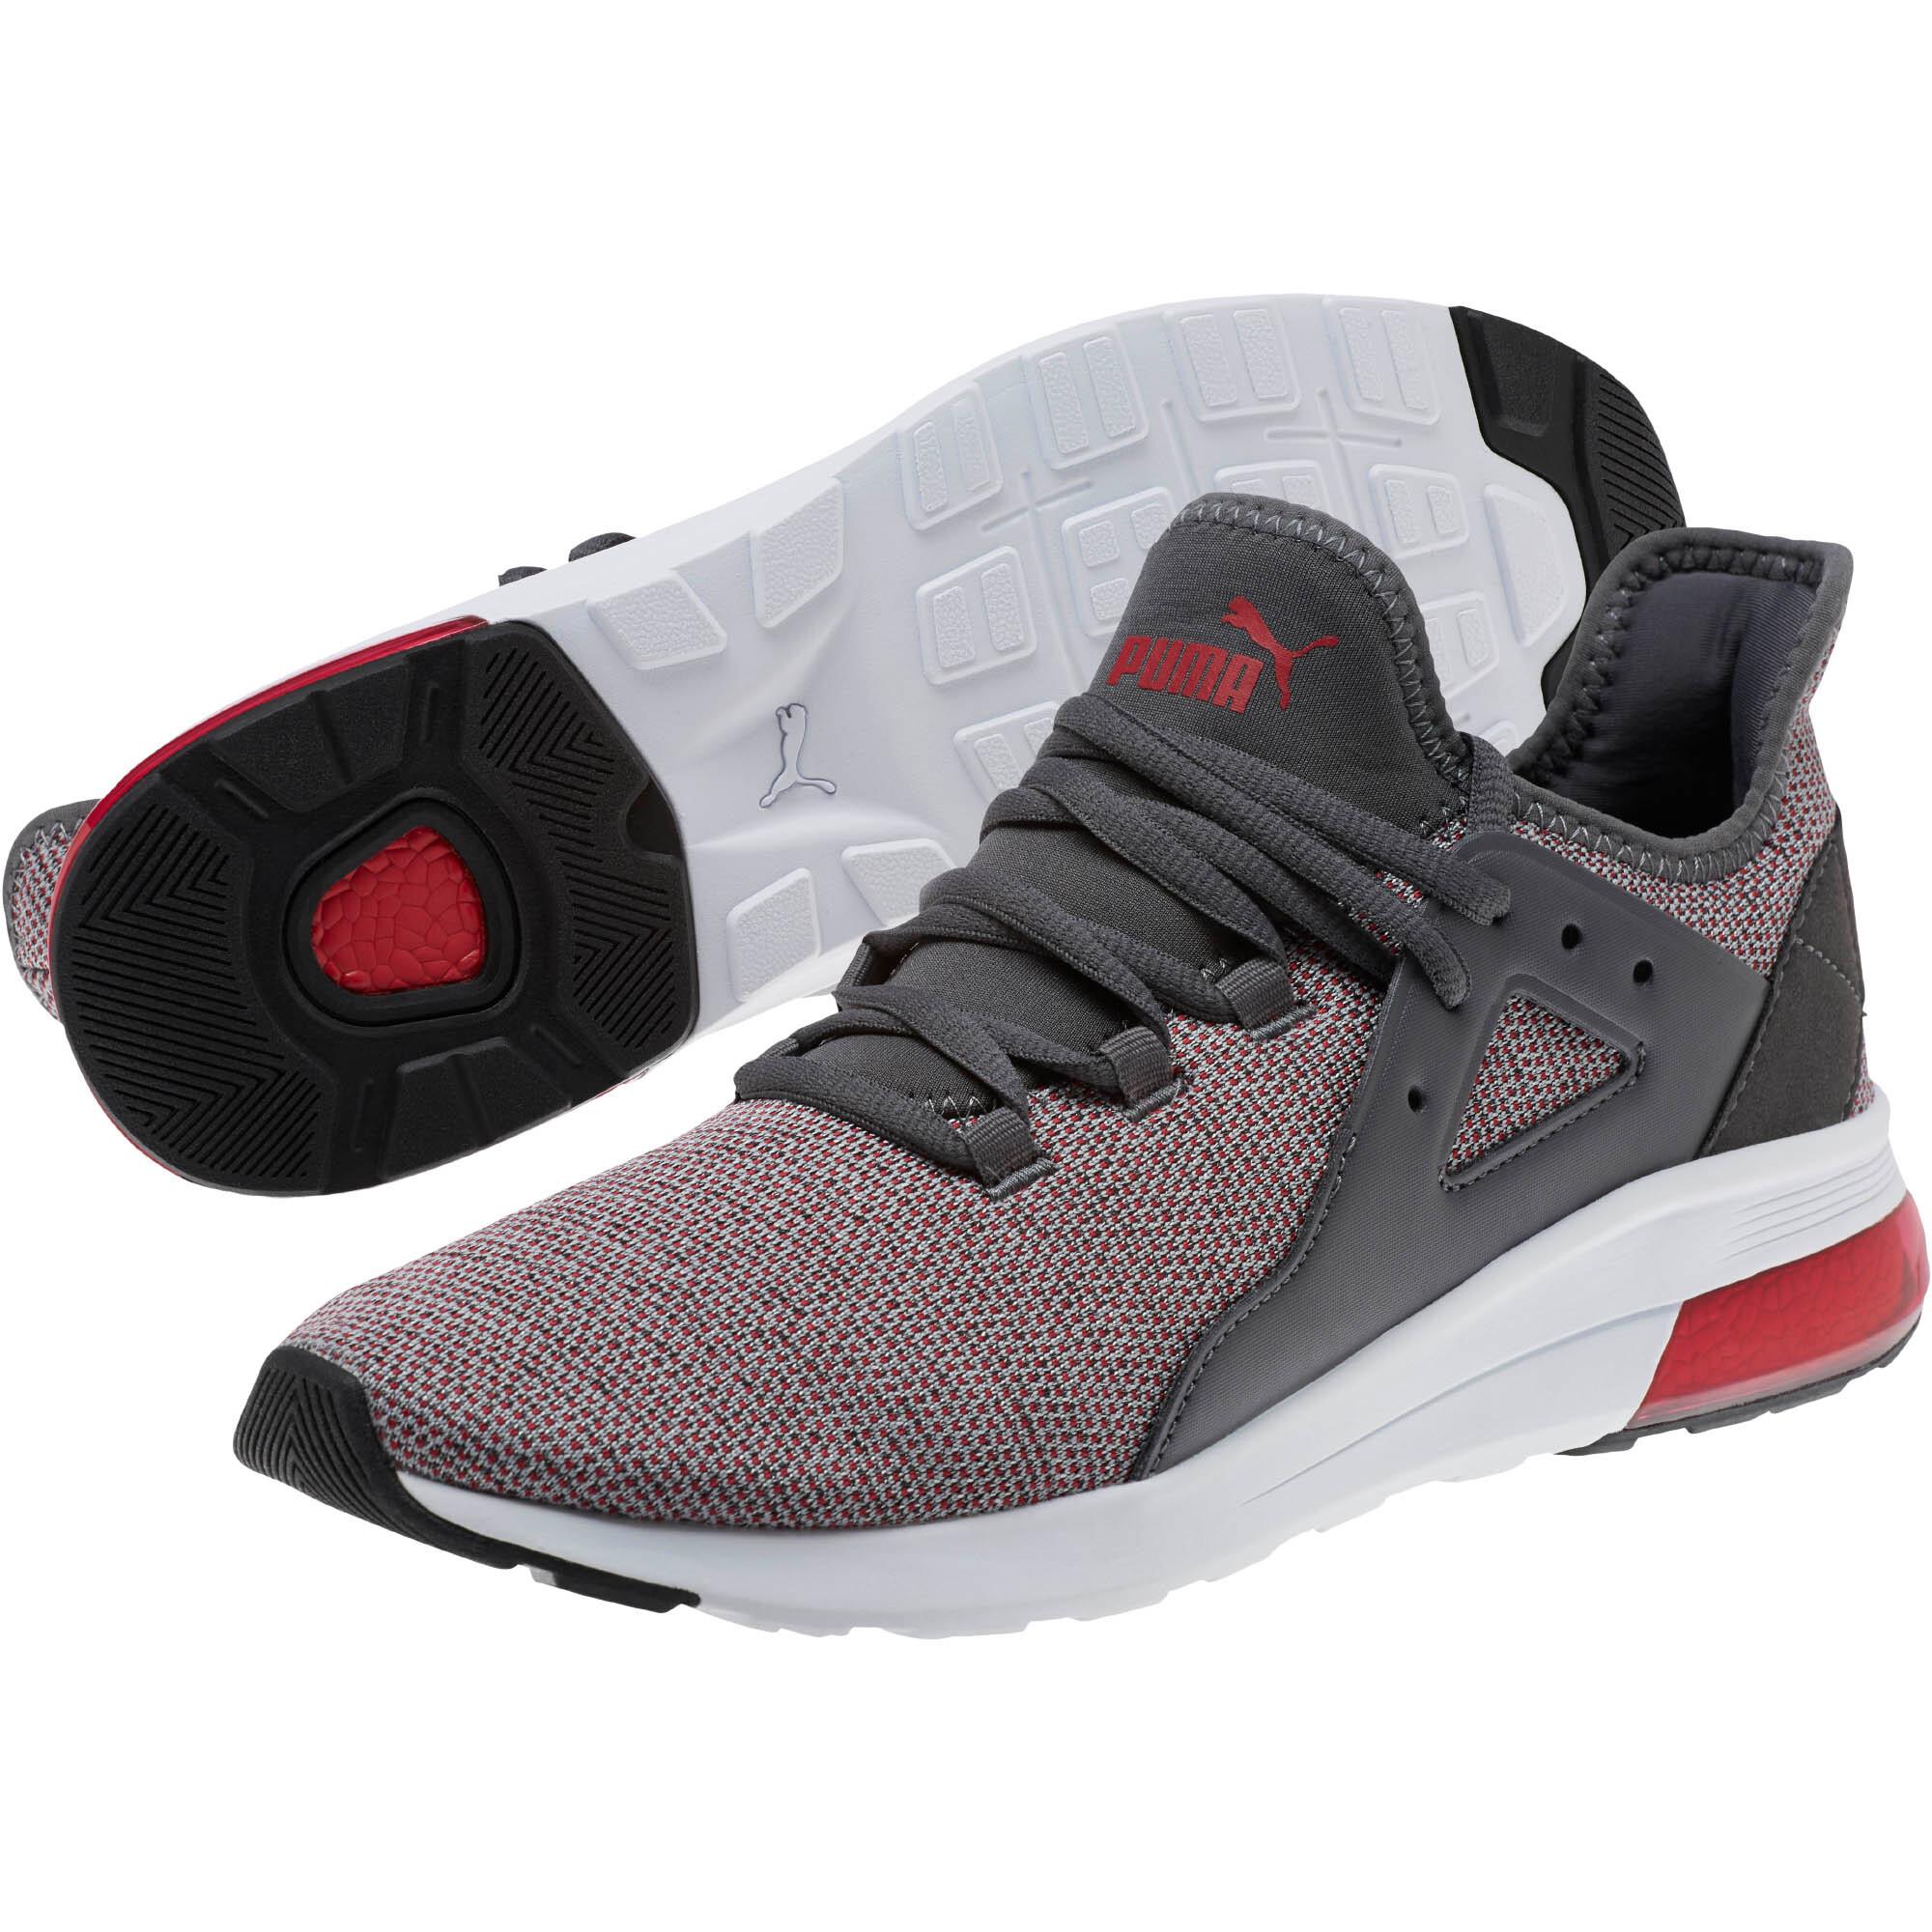 07ec75788b Details about PUMA Electron Street Knit Sneakers Men Shoe Basics